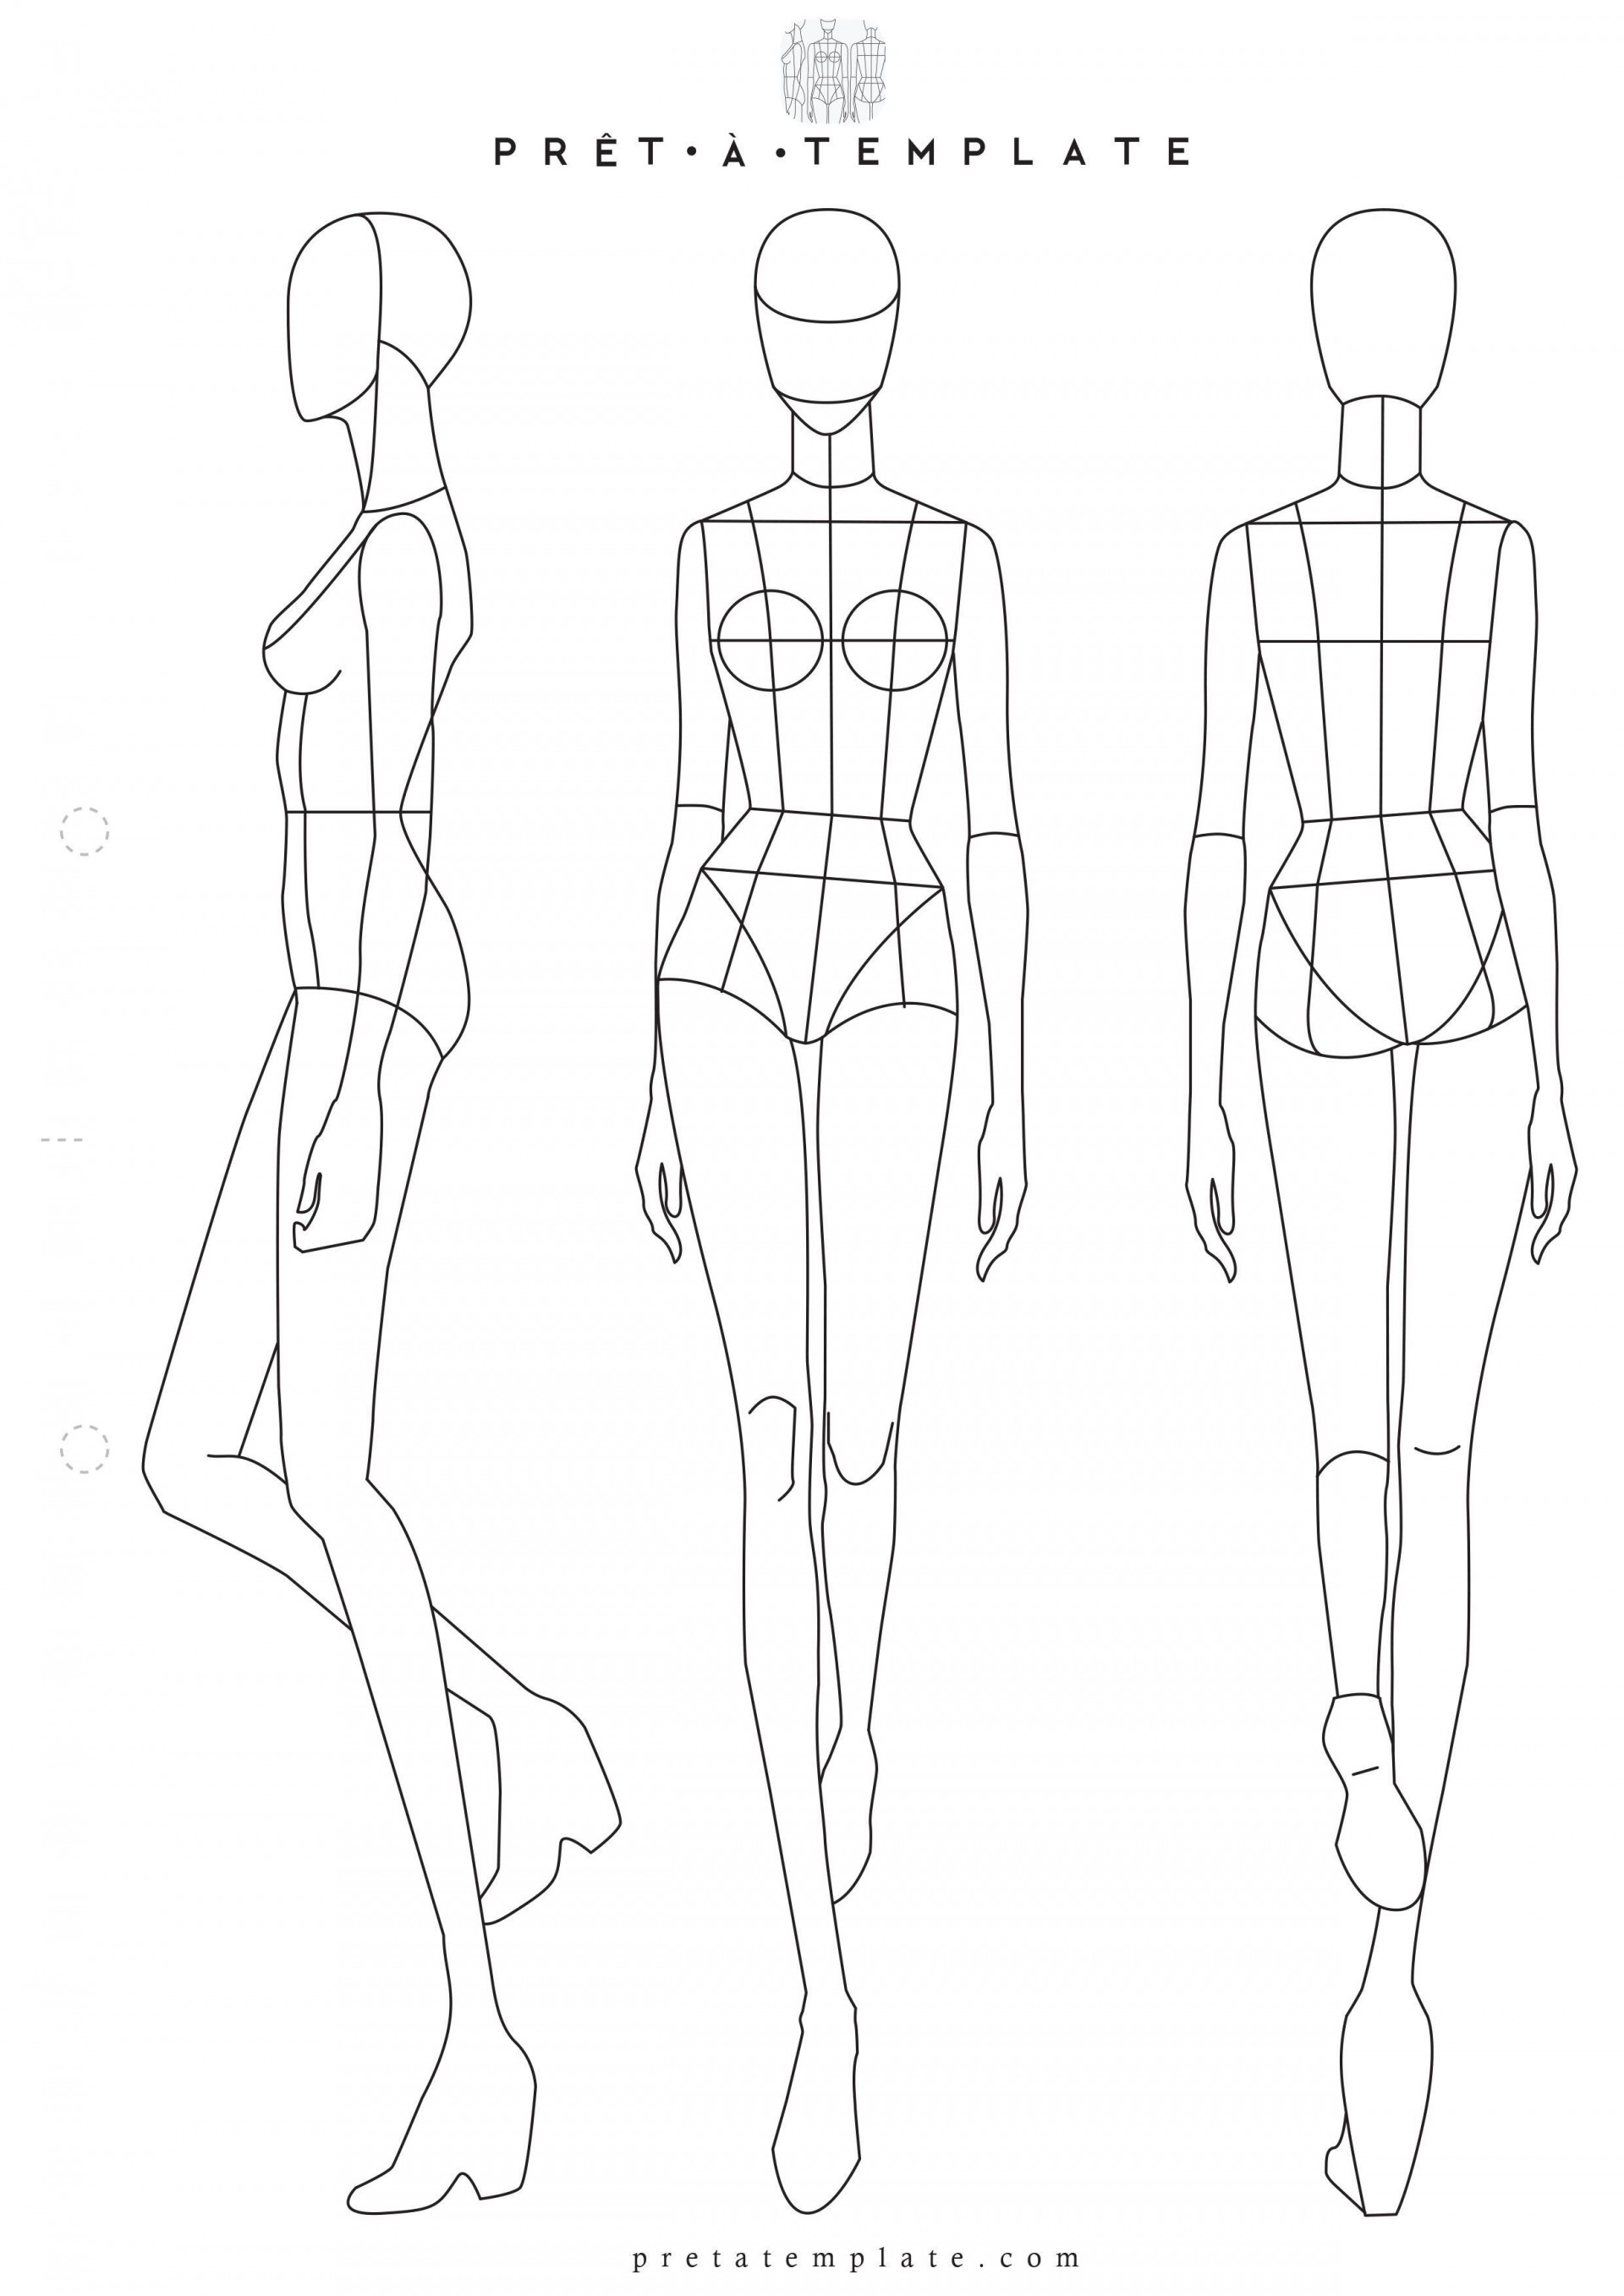 004 Fantastic Body Template For Fashion Design Photo  Female Male Human1920